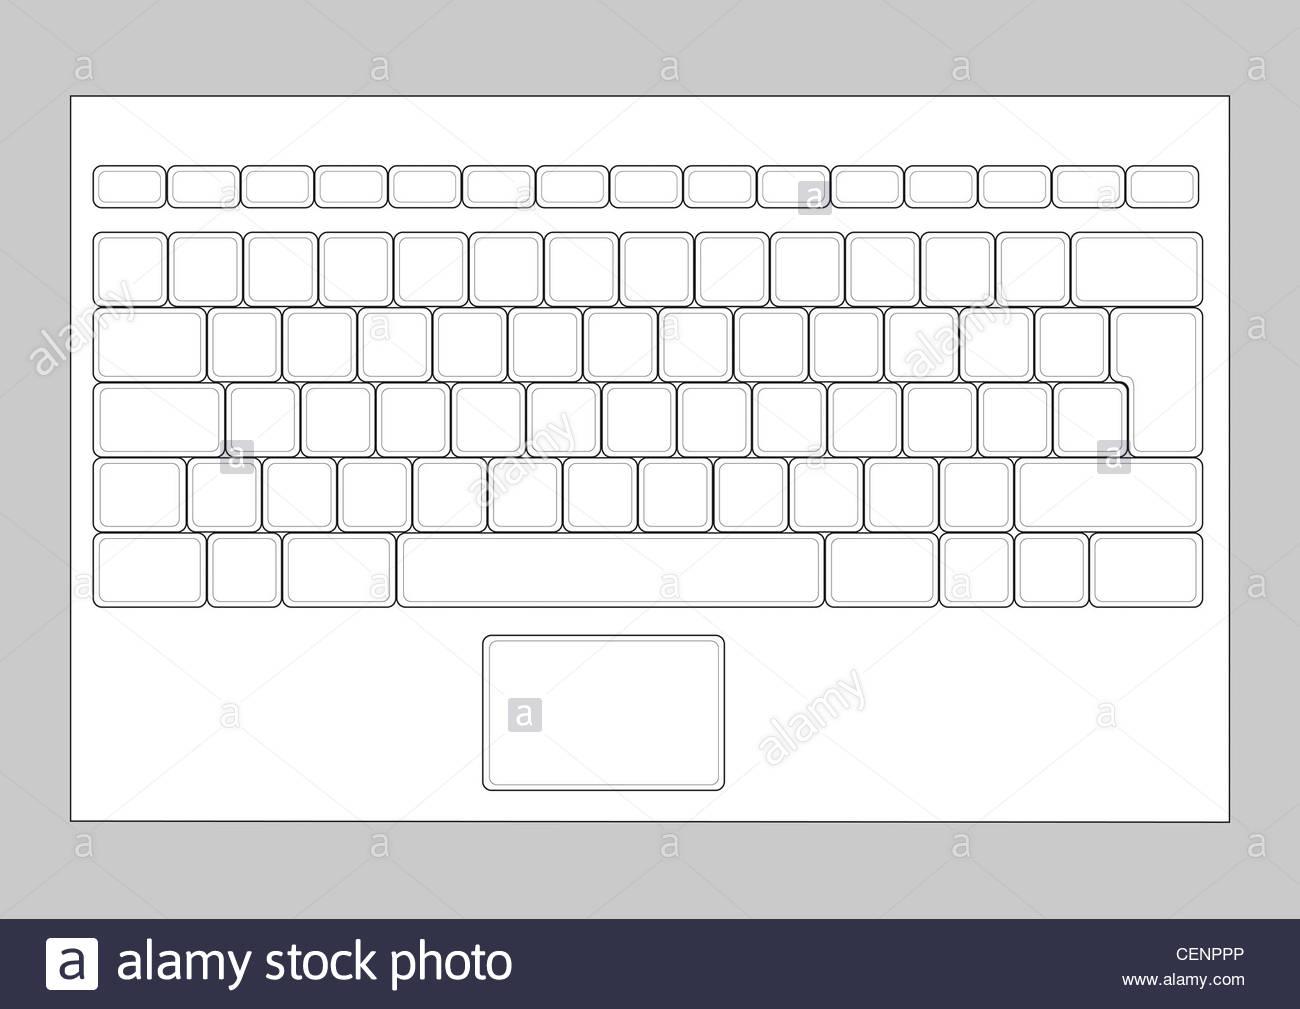 hight resolution of laptop blank keyboard layout computer input element stock image